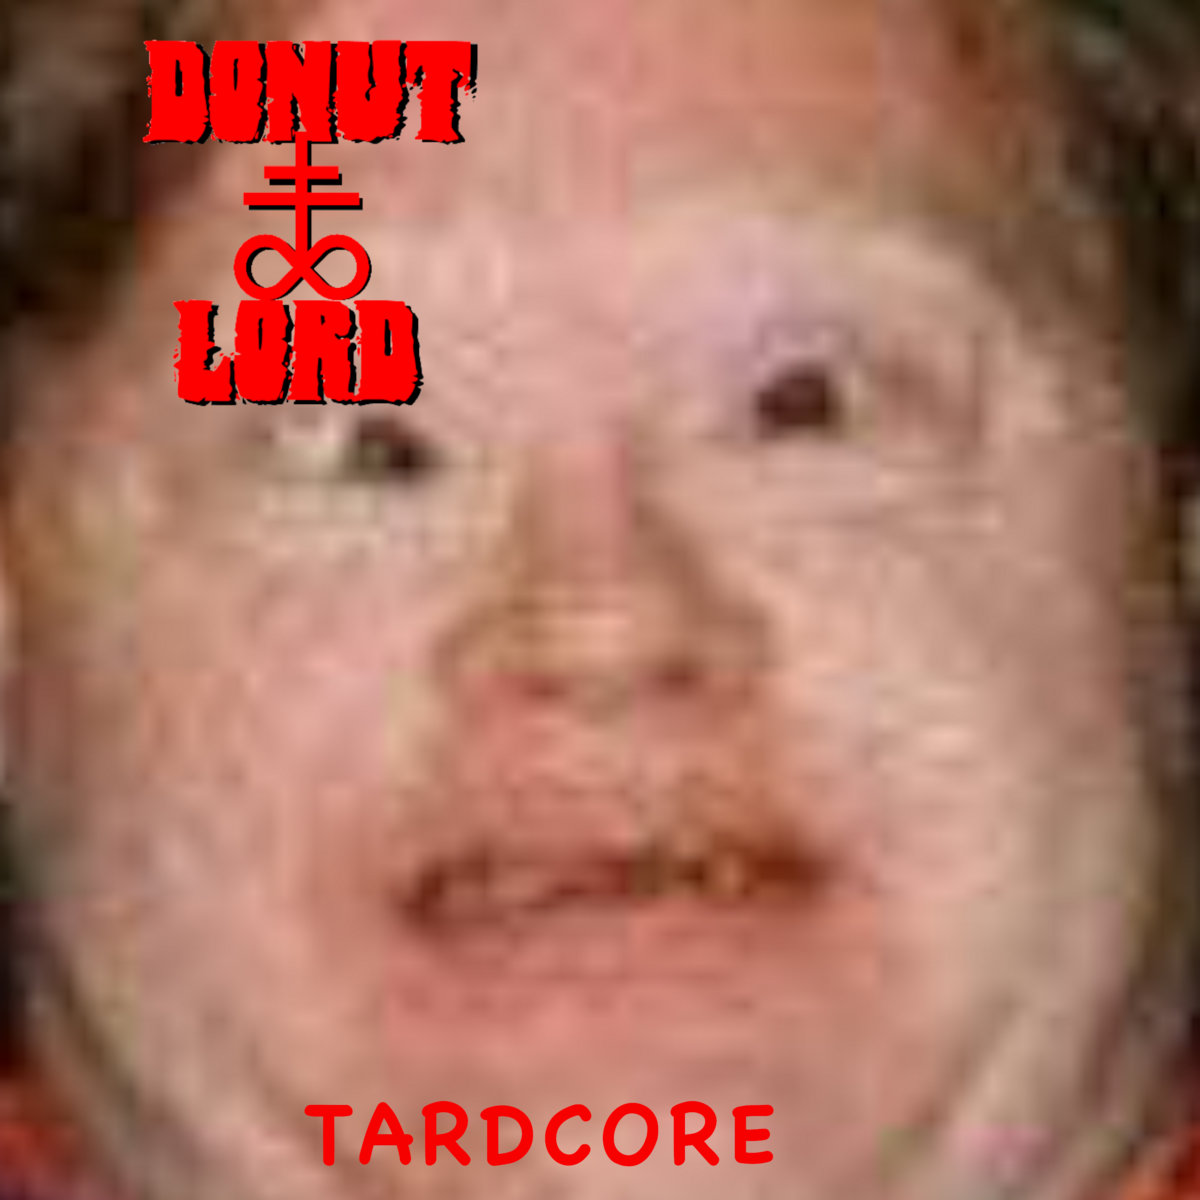 Donut Lord - Tardcore